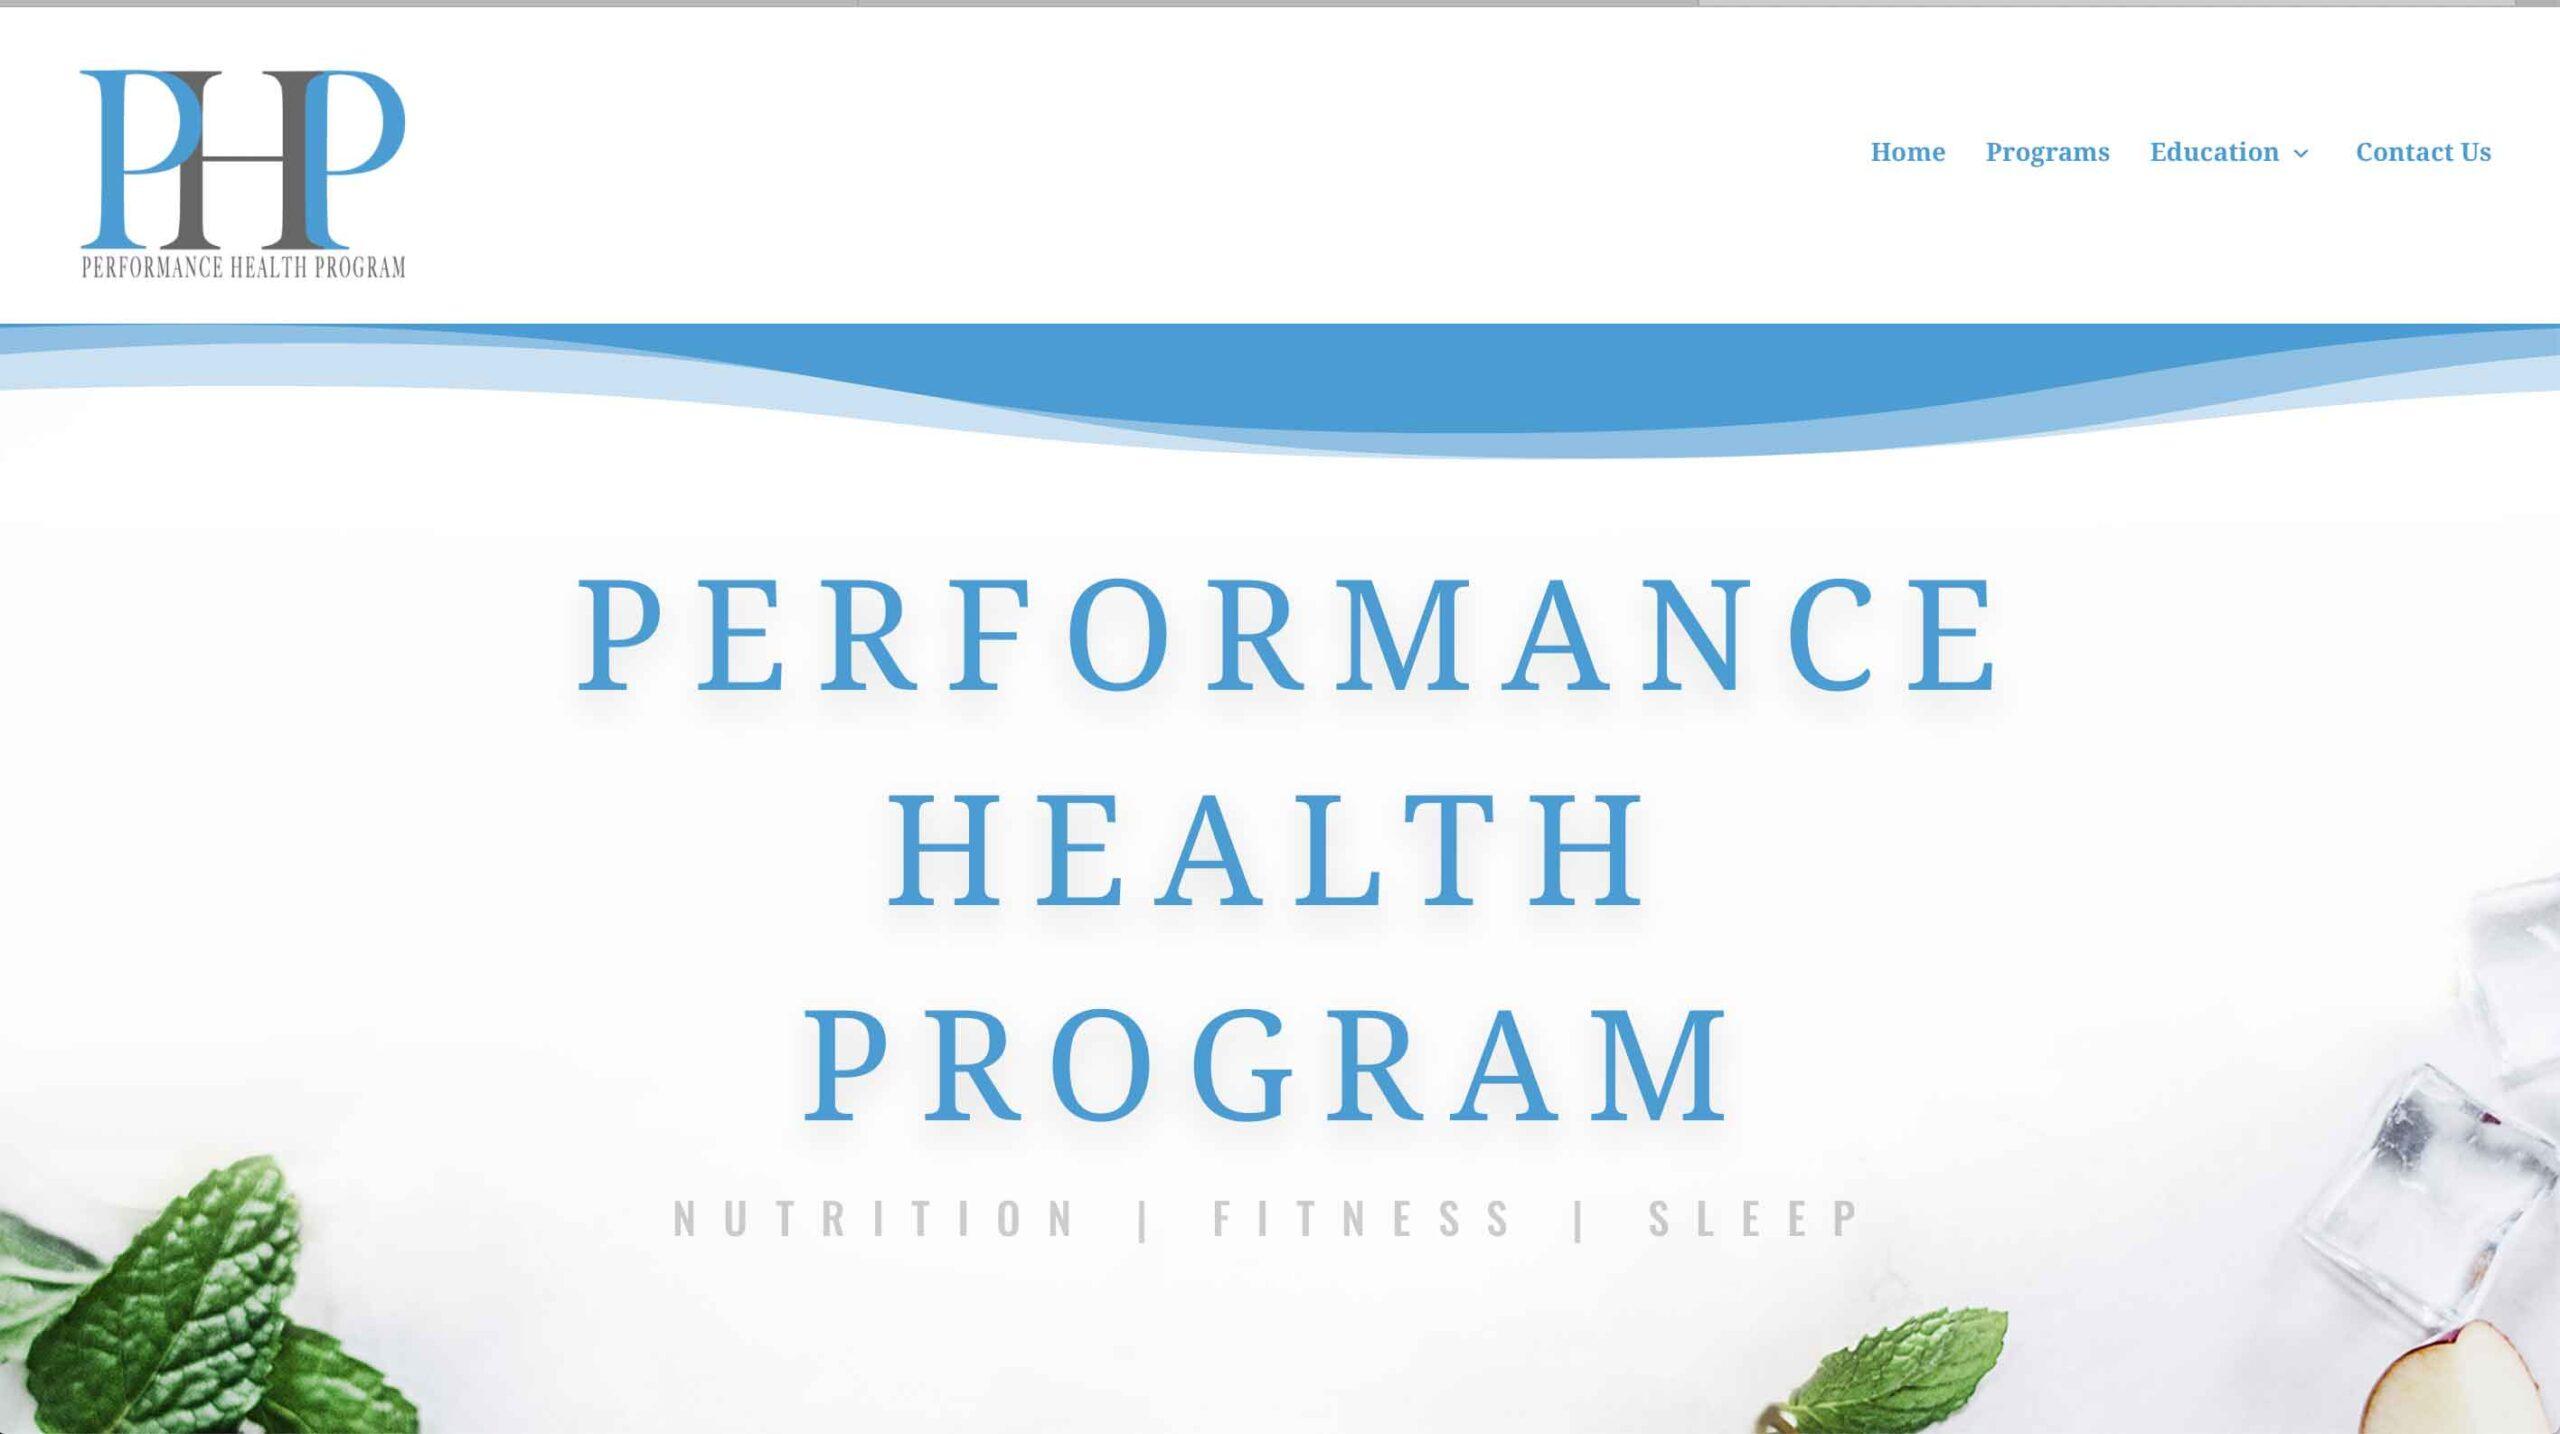 WebHappy Creative - Performance Health Program Site